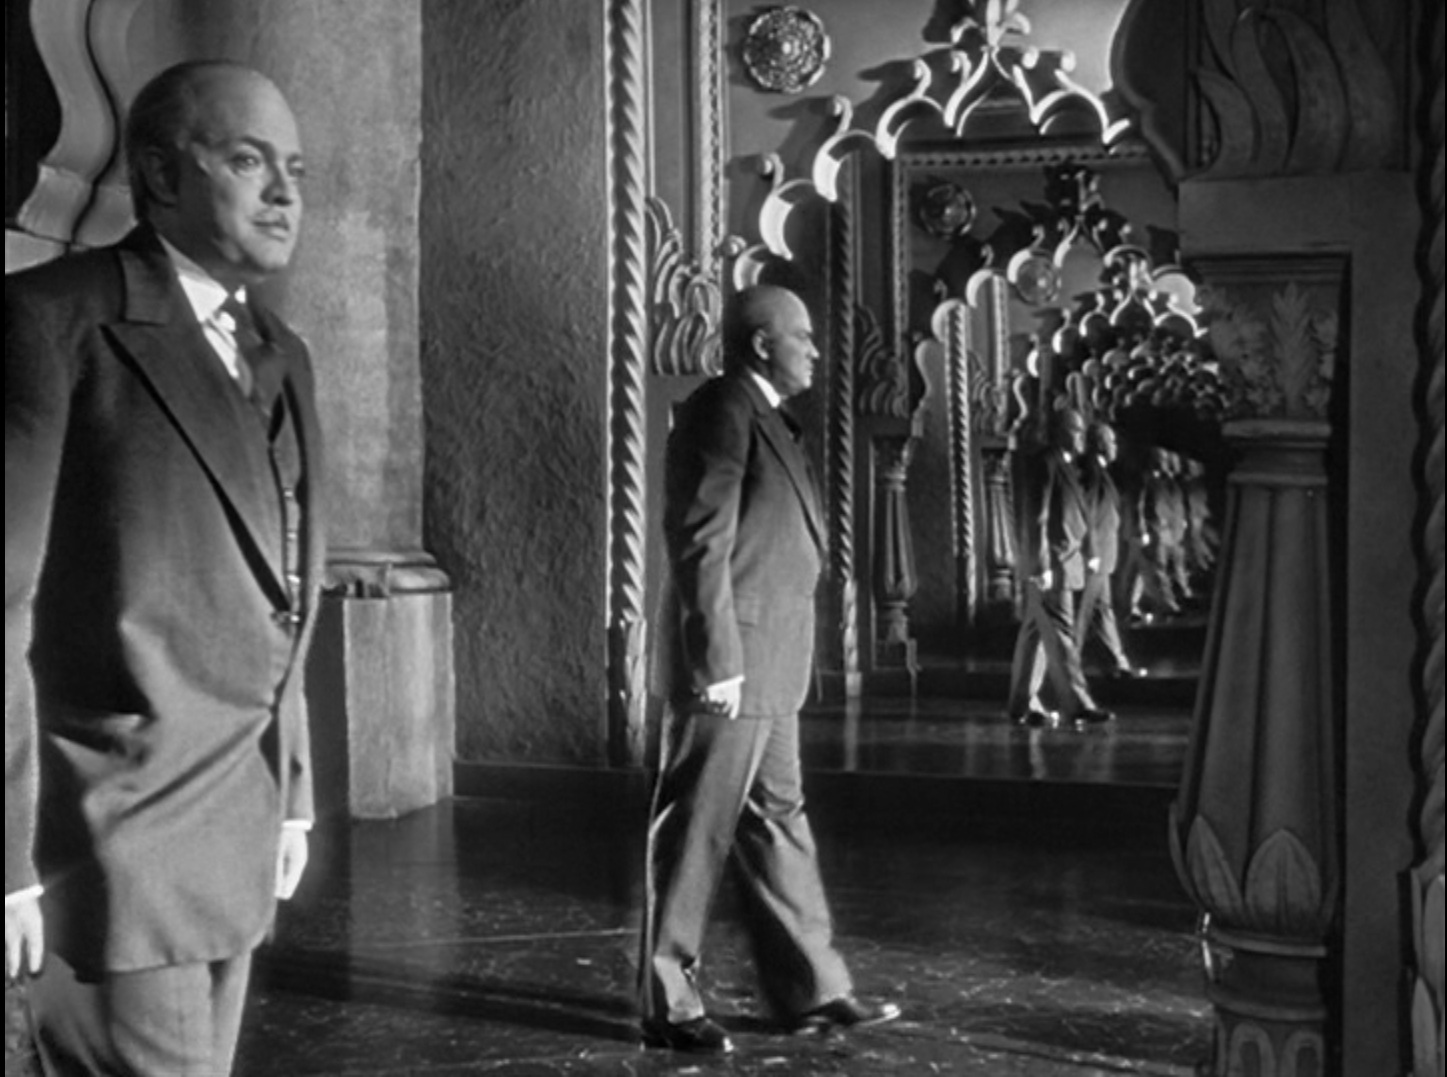 Citizen Kane . Man or myth?